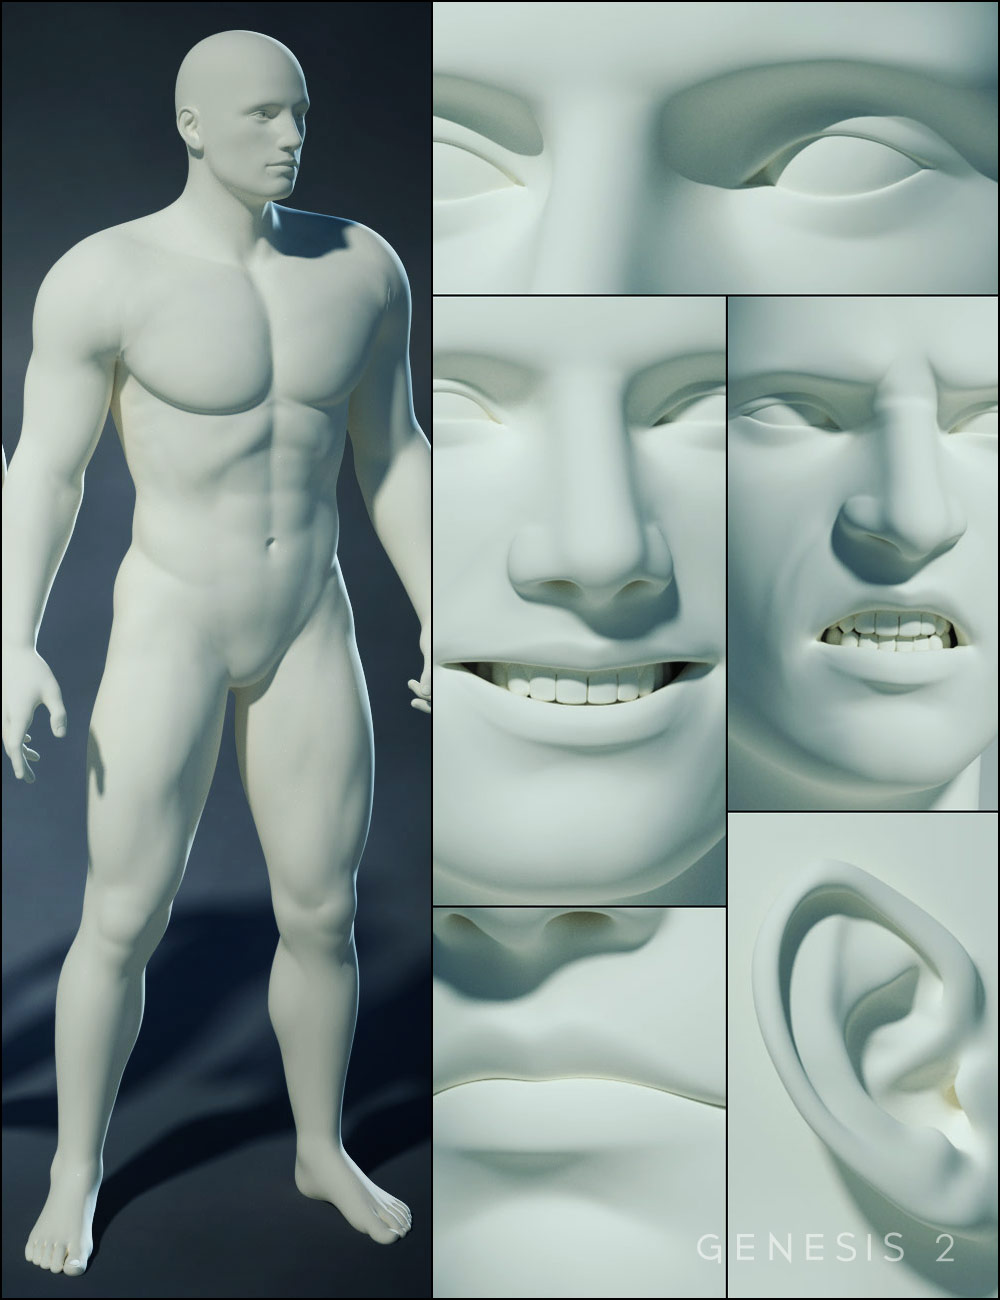 Genesis 2 Male Morphs Bundle by: , 3D Models by Daz 3D